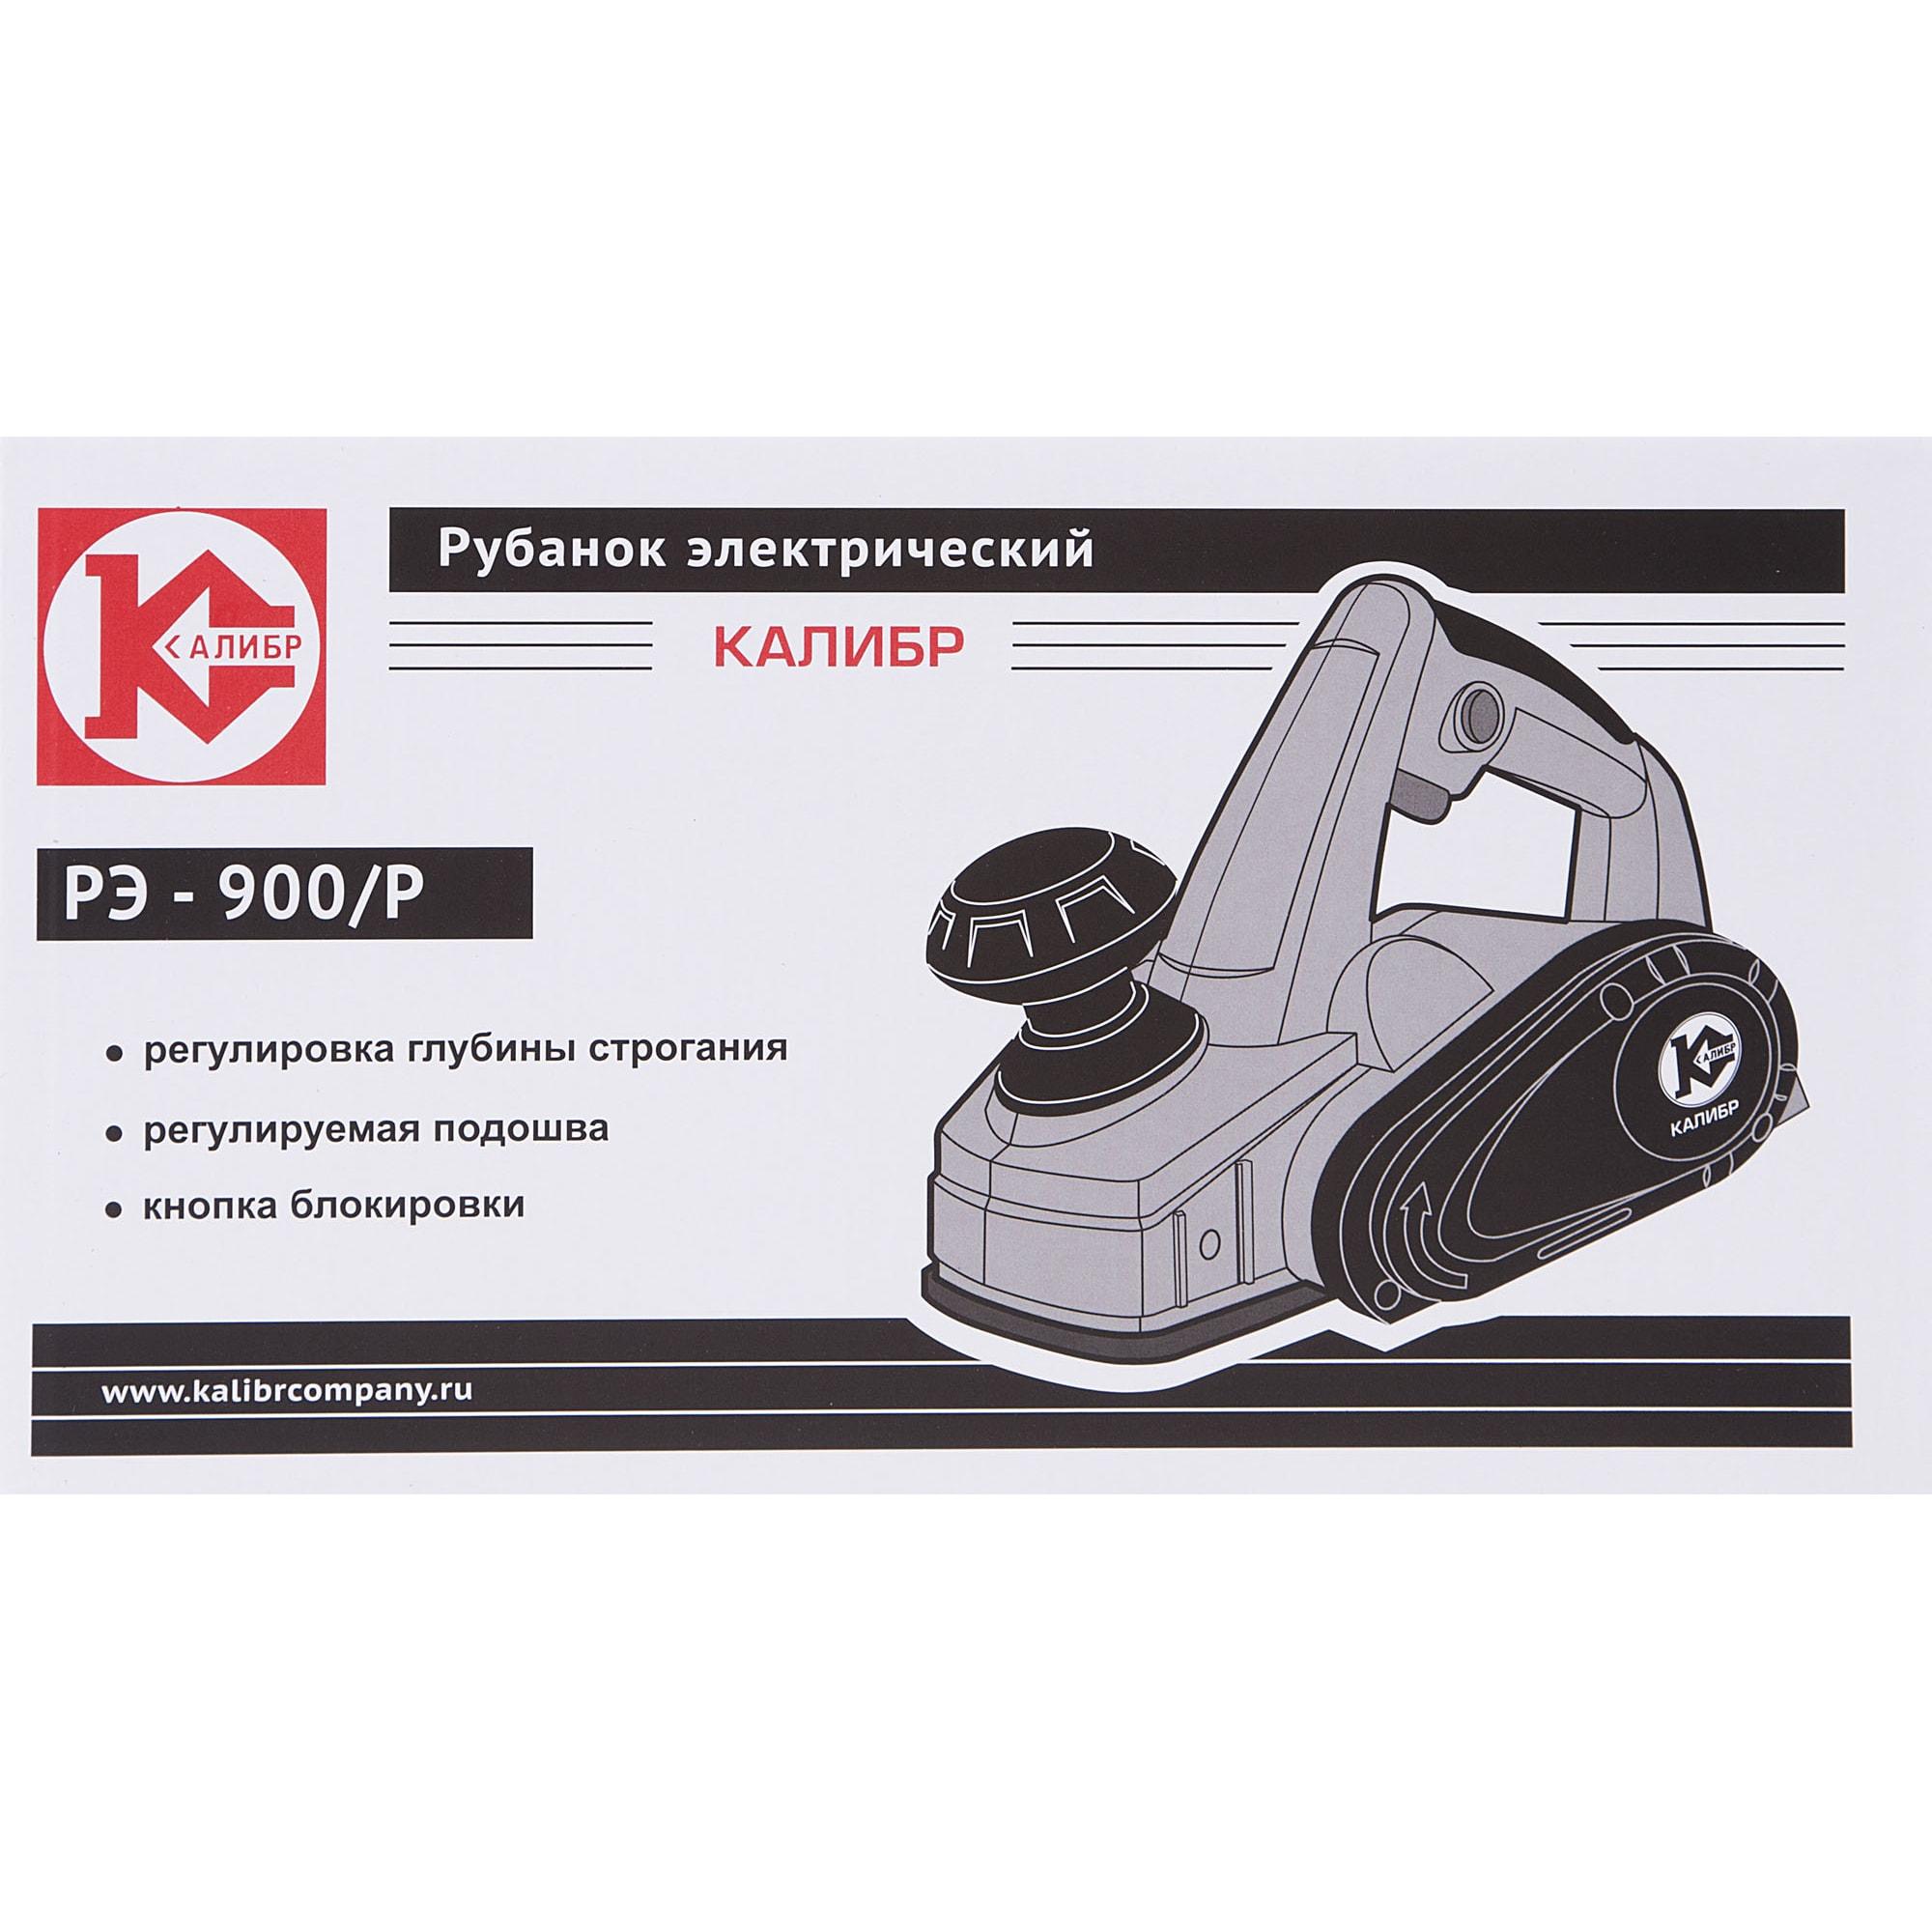 Калибр РЭ-900/Р